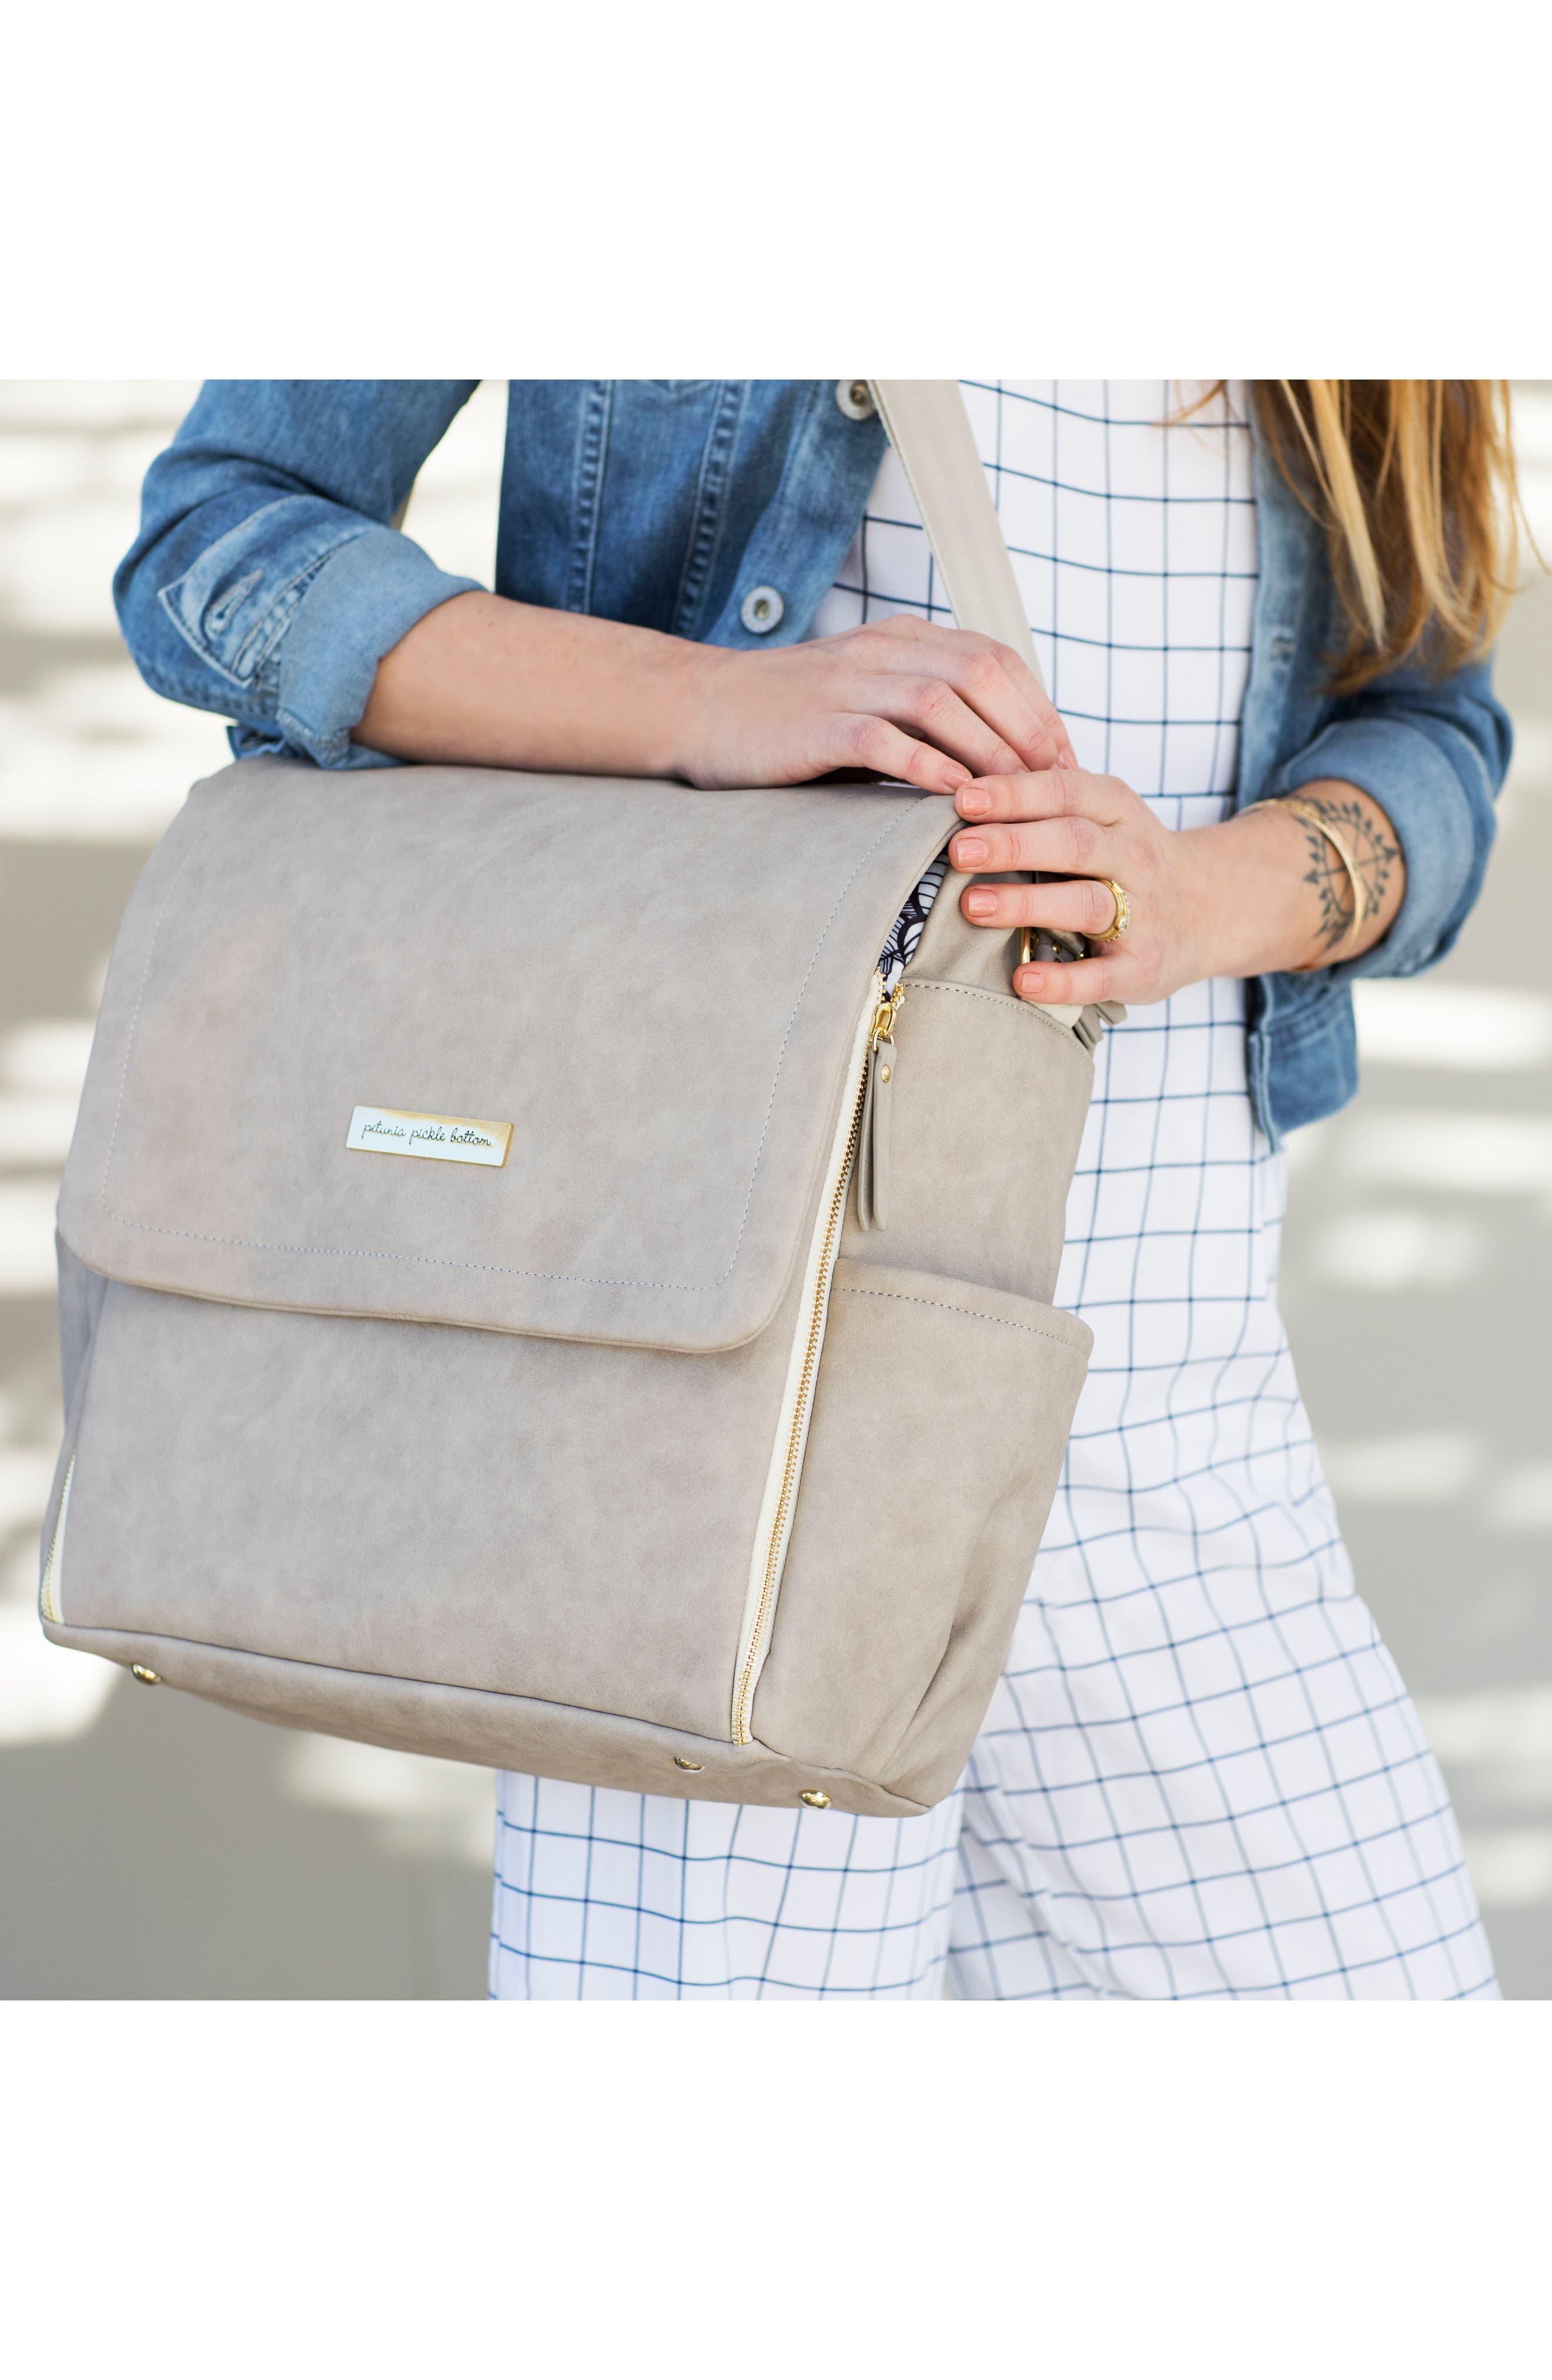 Boxy Backpack Diaper Bag,                             Alternate thumbnail 7, color,